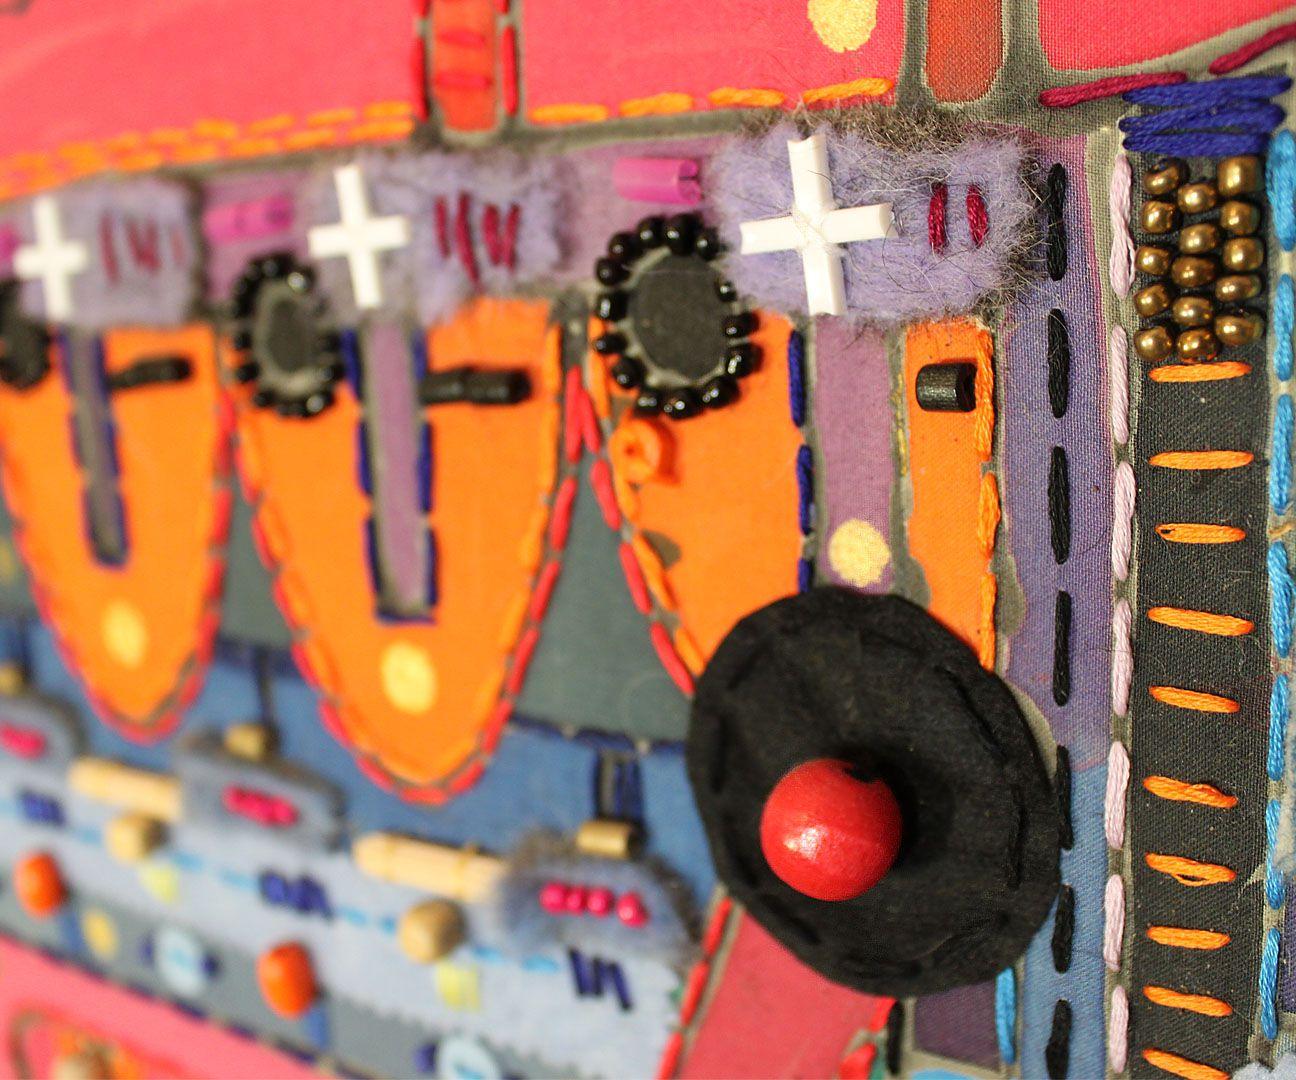 colorful techno interior ethno batik painting